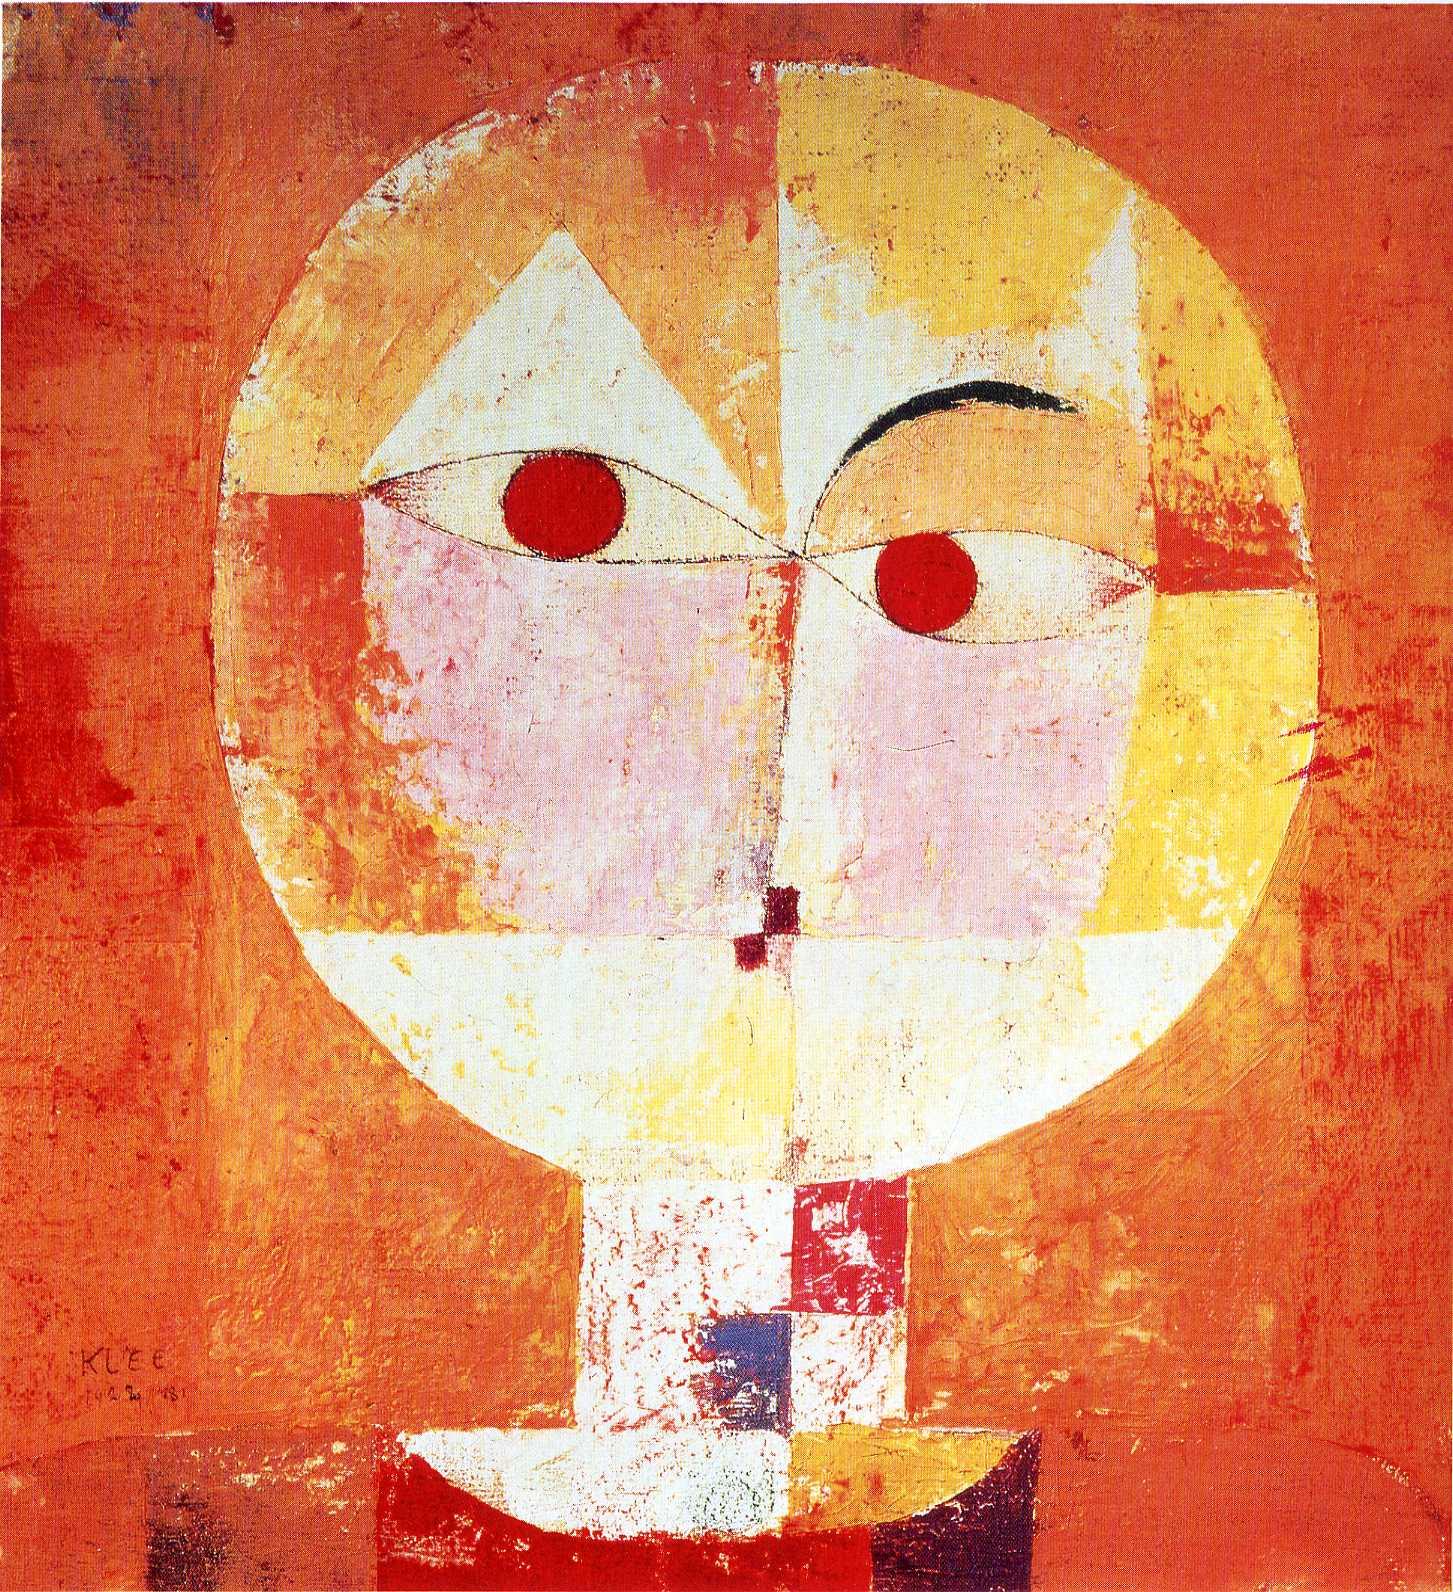 Senecio, 1922 - Paul Klee - WikiArt.org